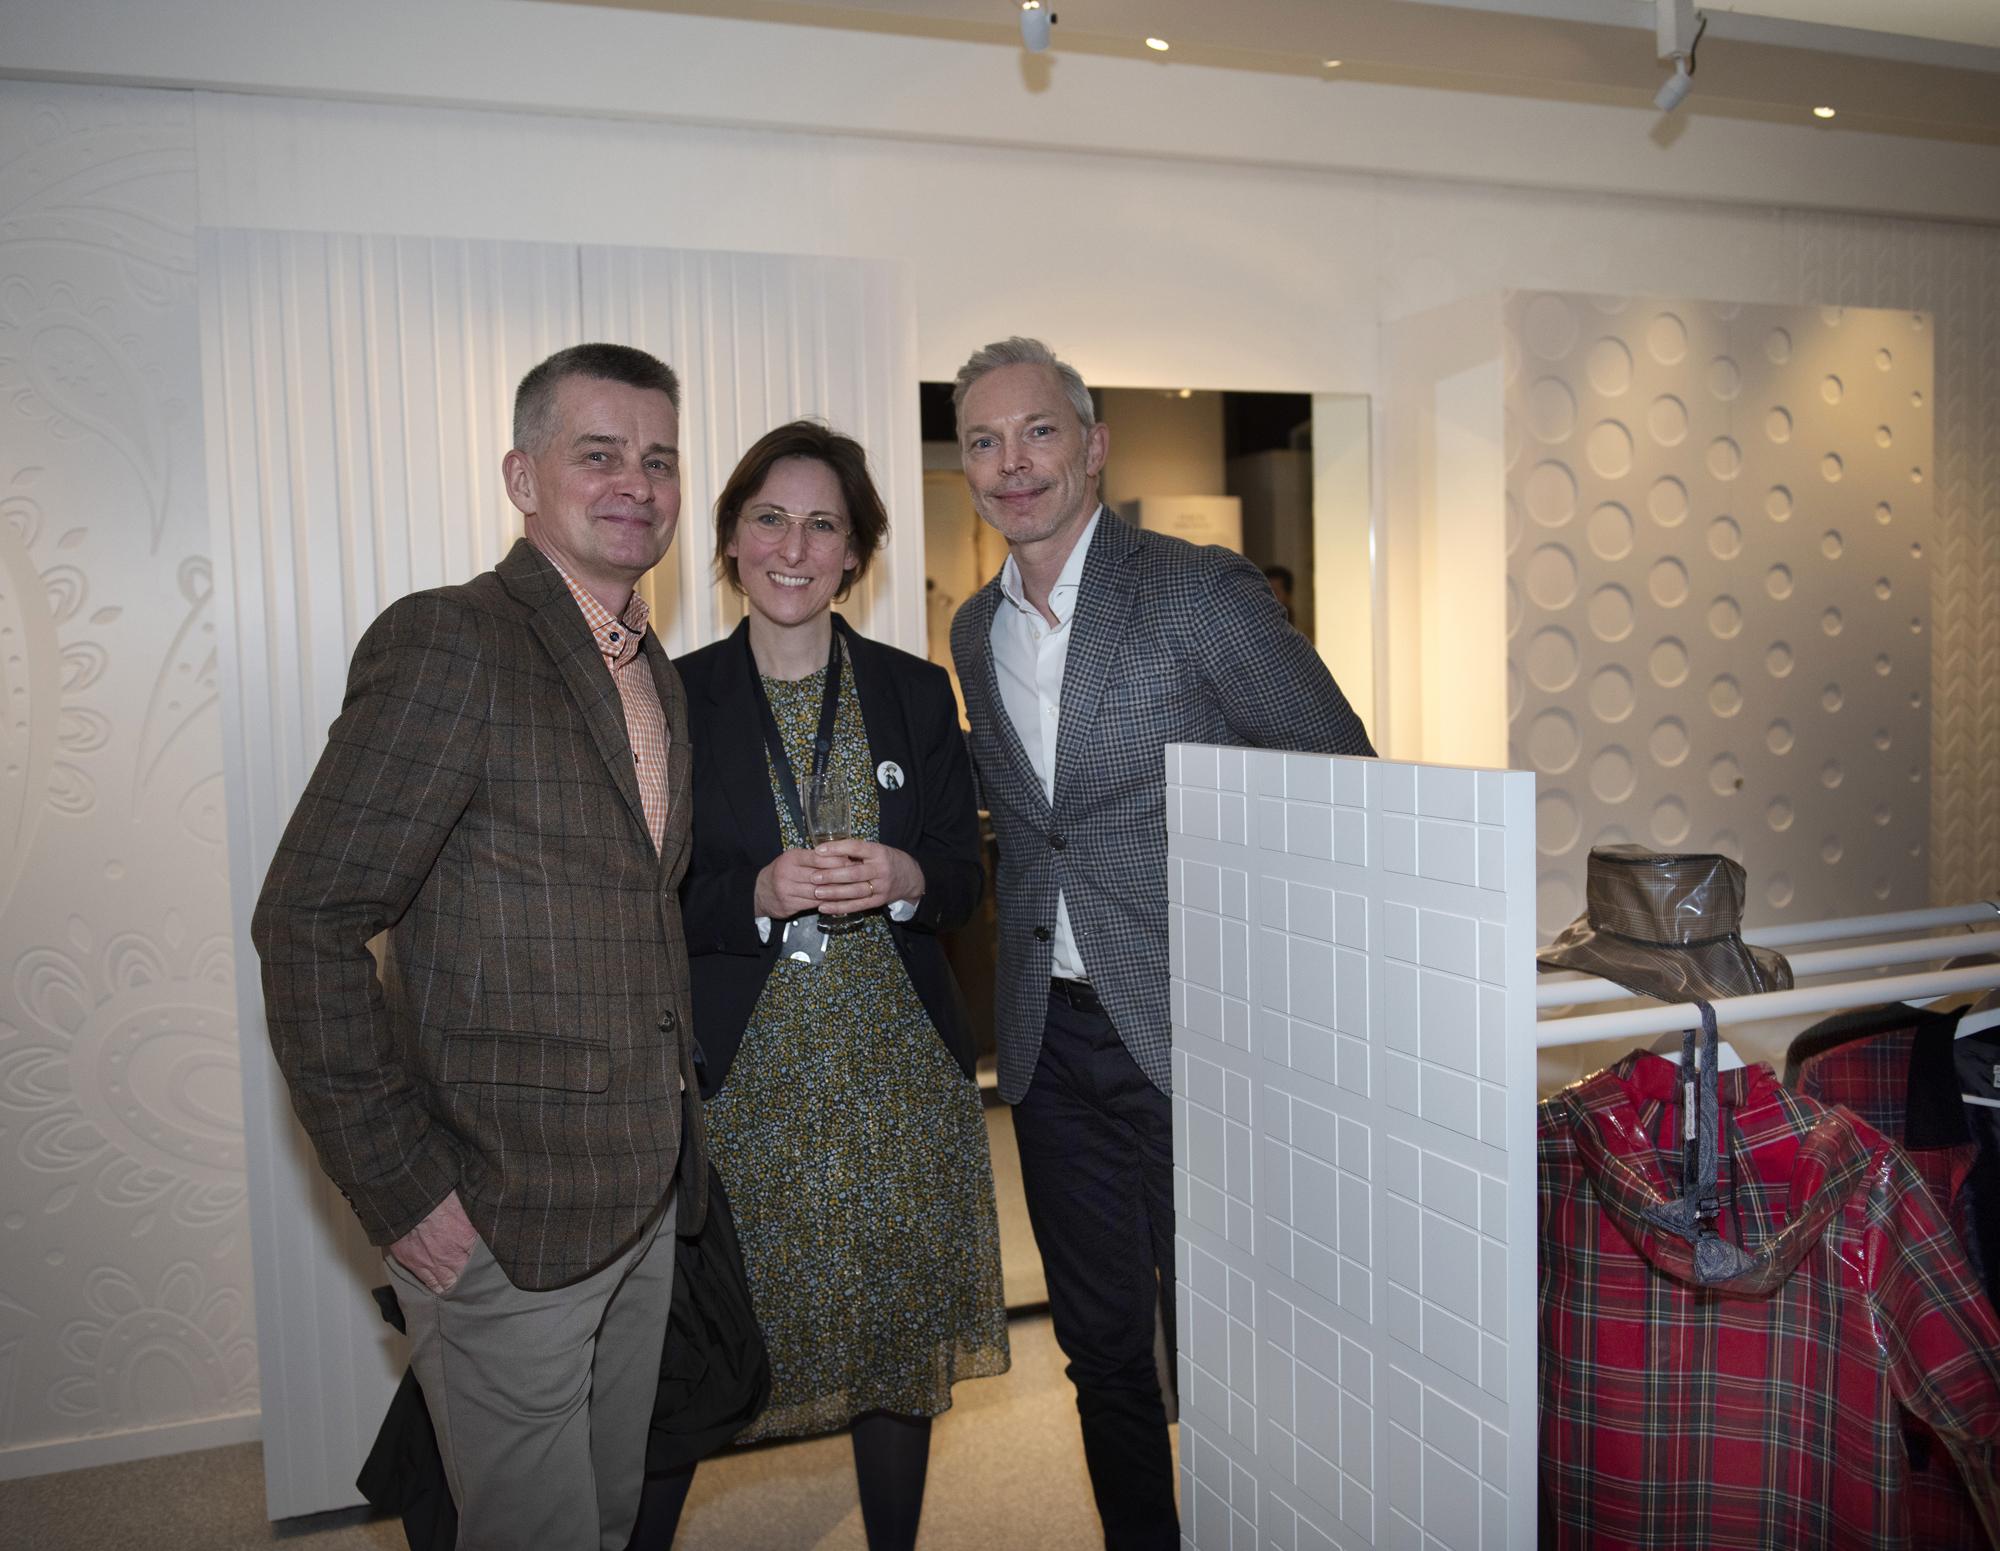 Pekka Heino, Elna Nord, Nordiska museet och Erik Kristensen